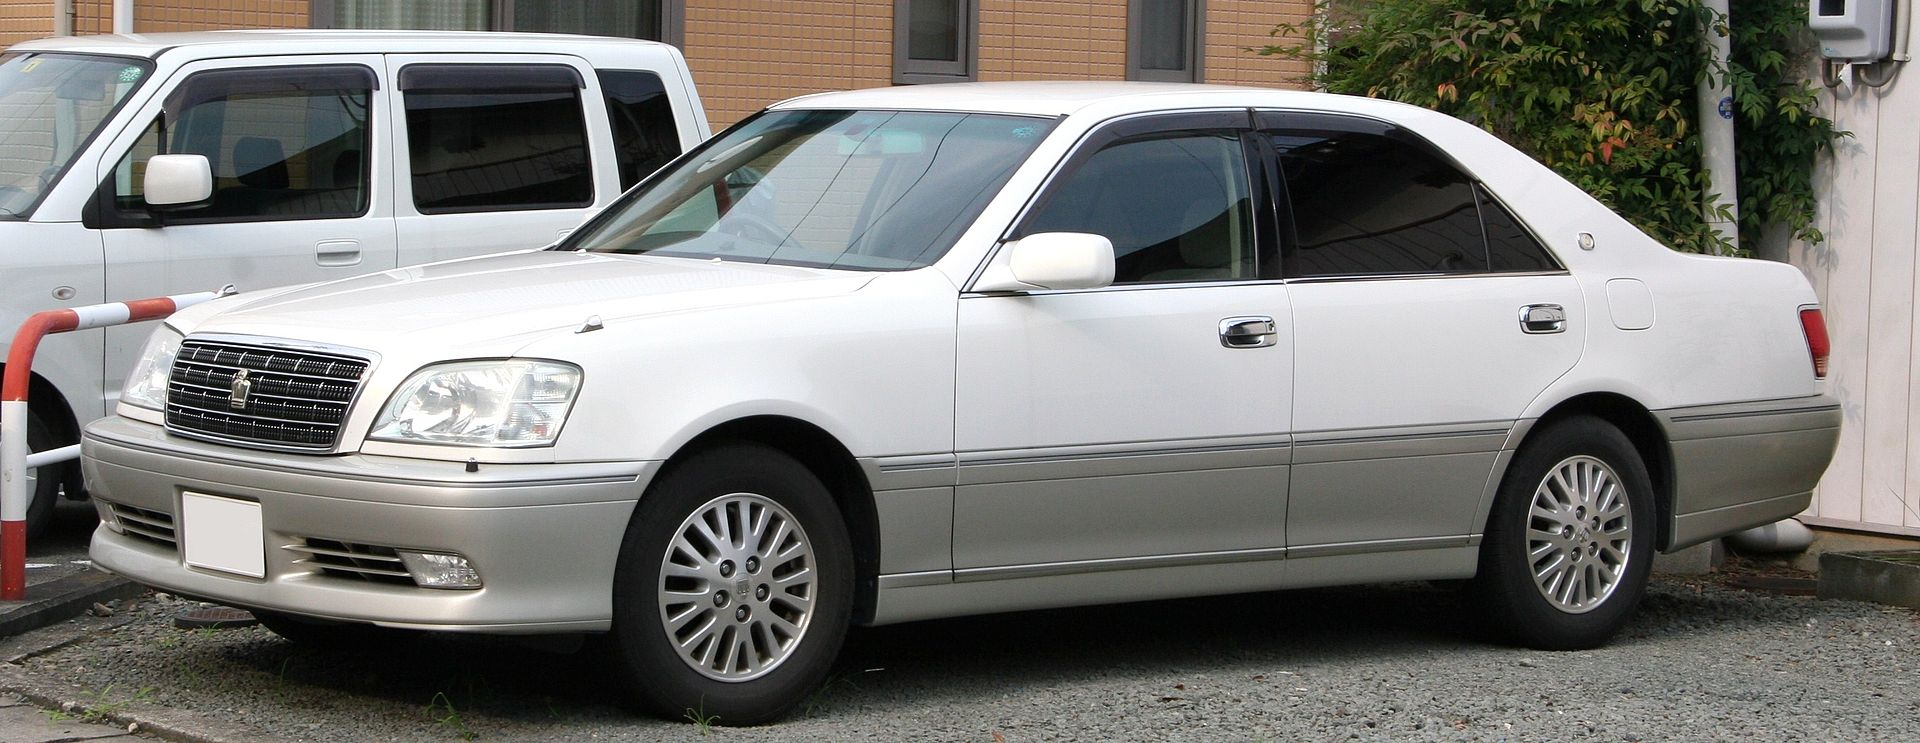 Toyota Crown Royal S170.jpg